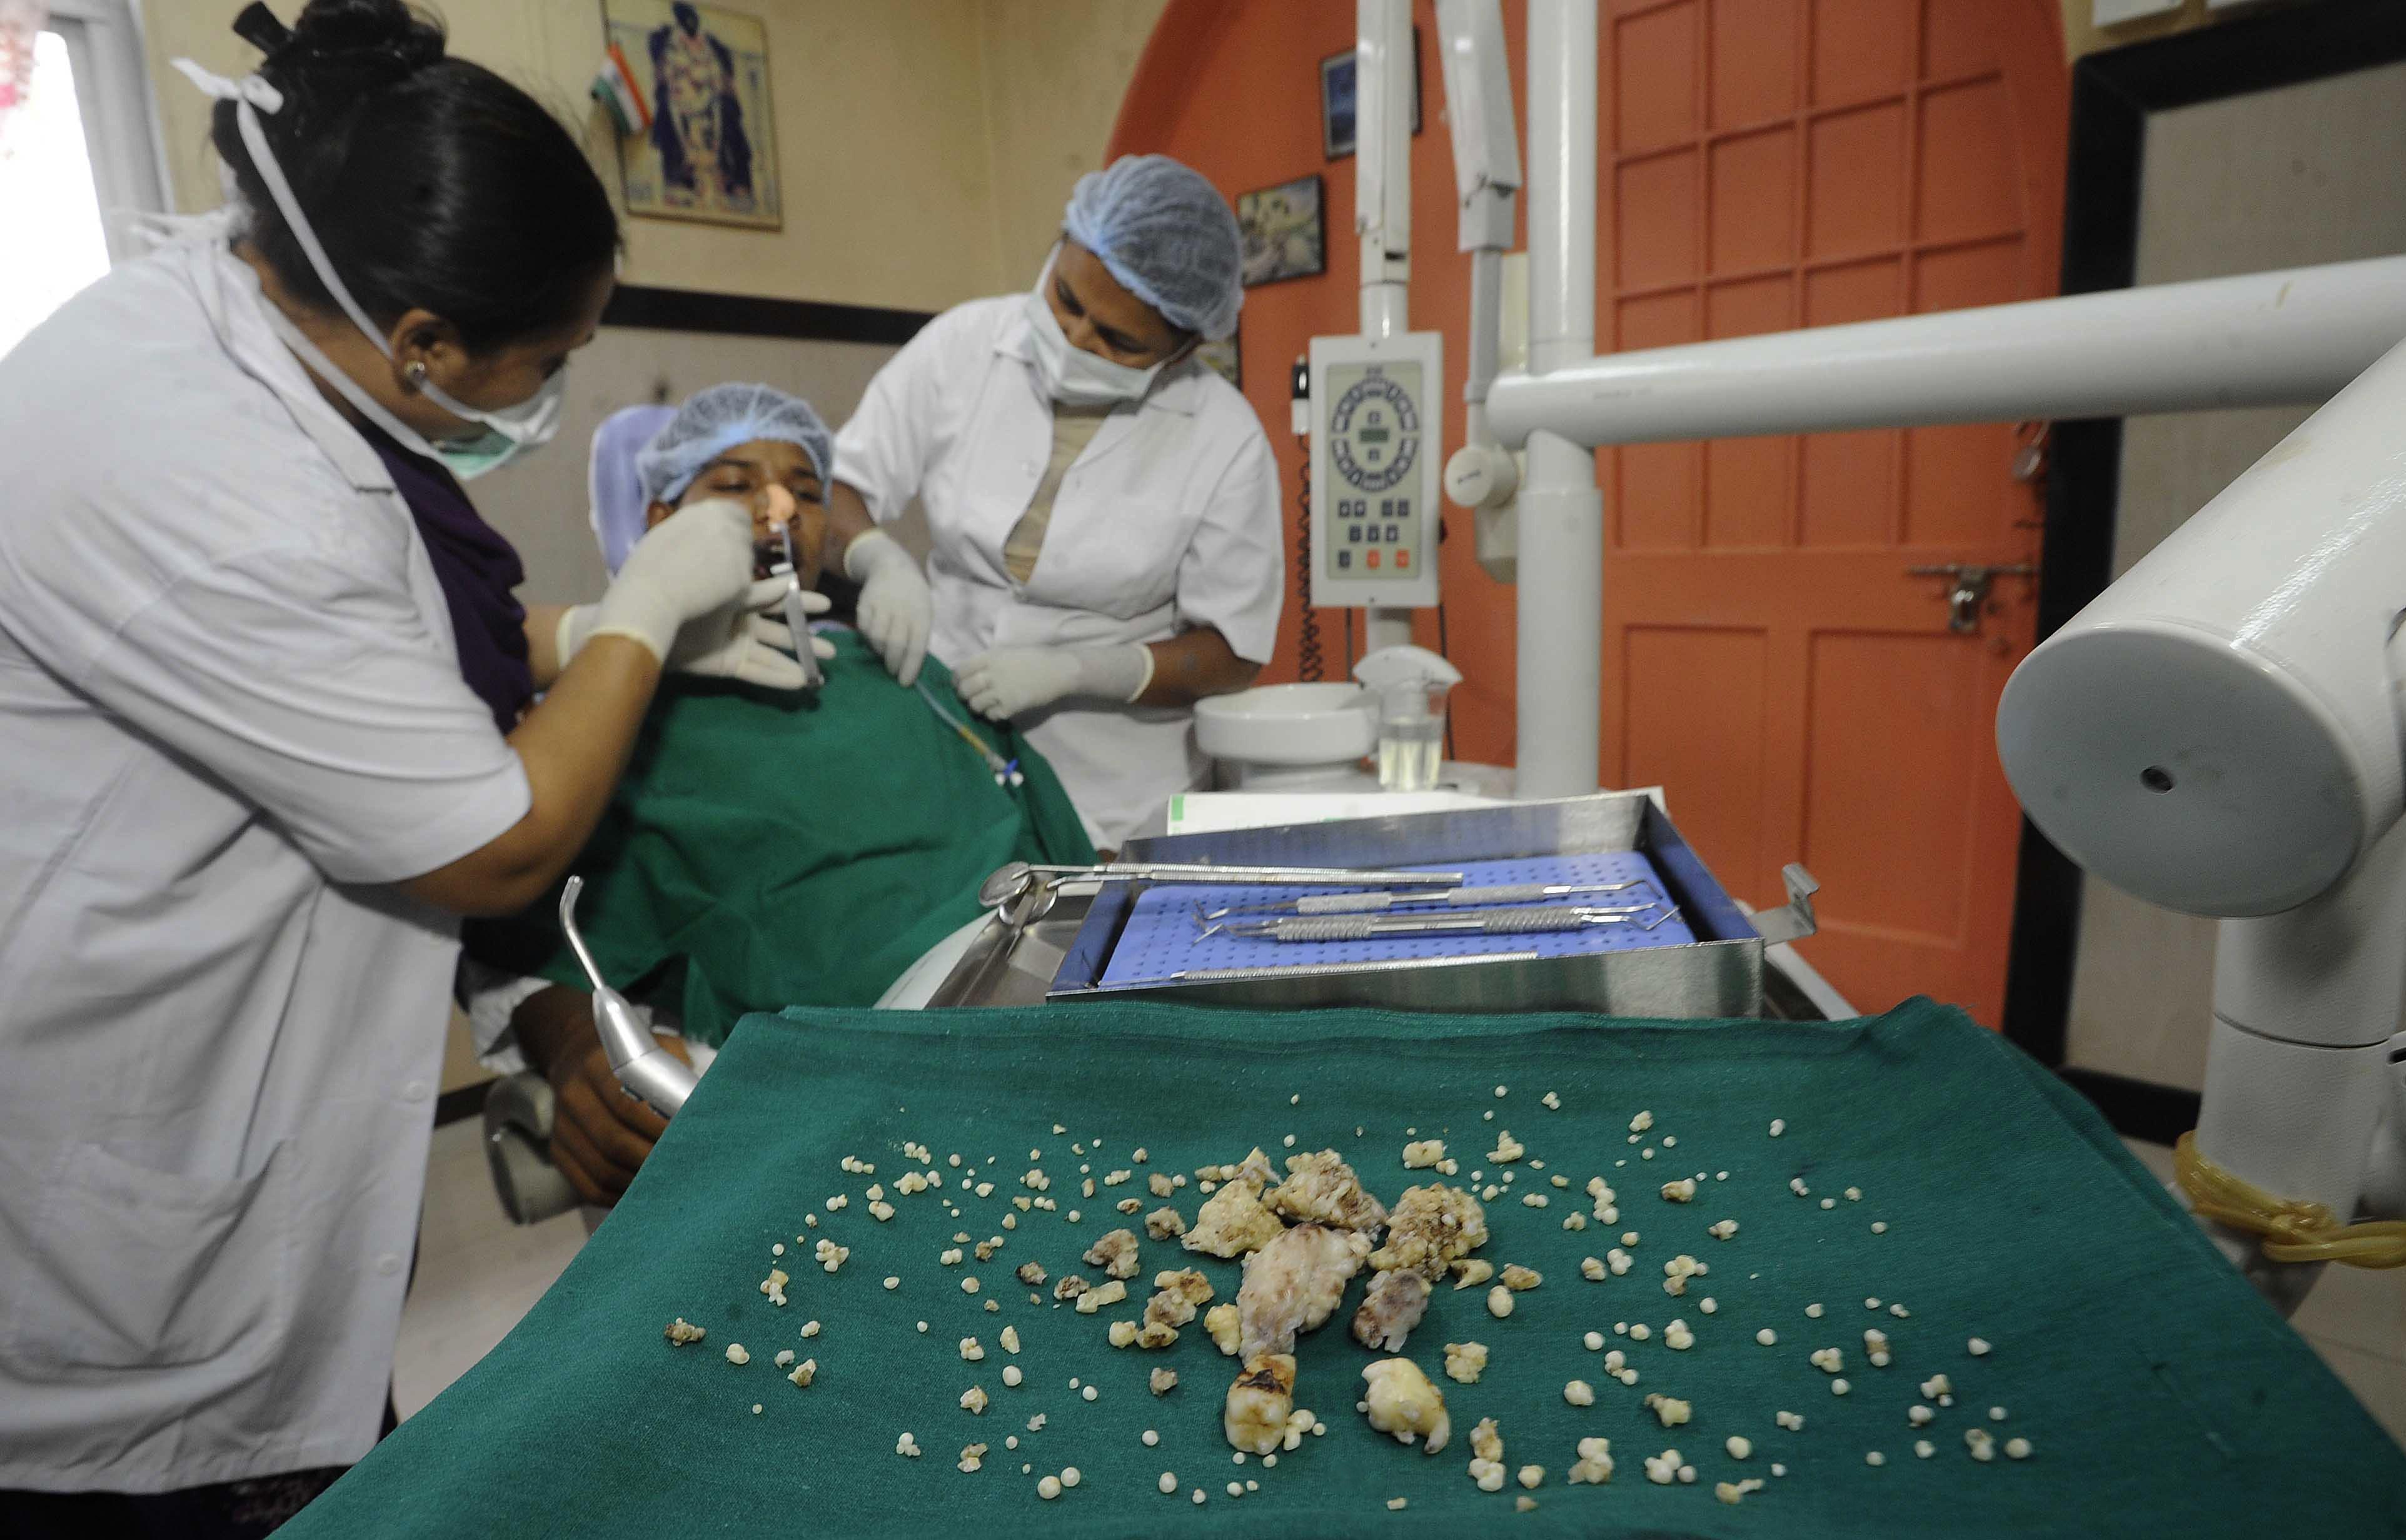 Indian dentists operate on Ashik Gavai at JJ Hospital in Mumbai on July 22, 2014,